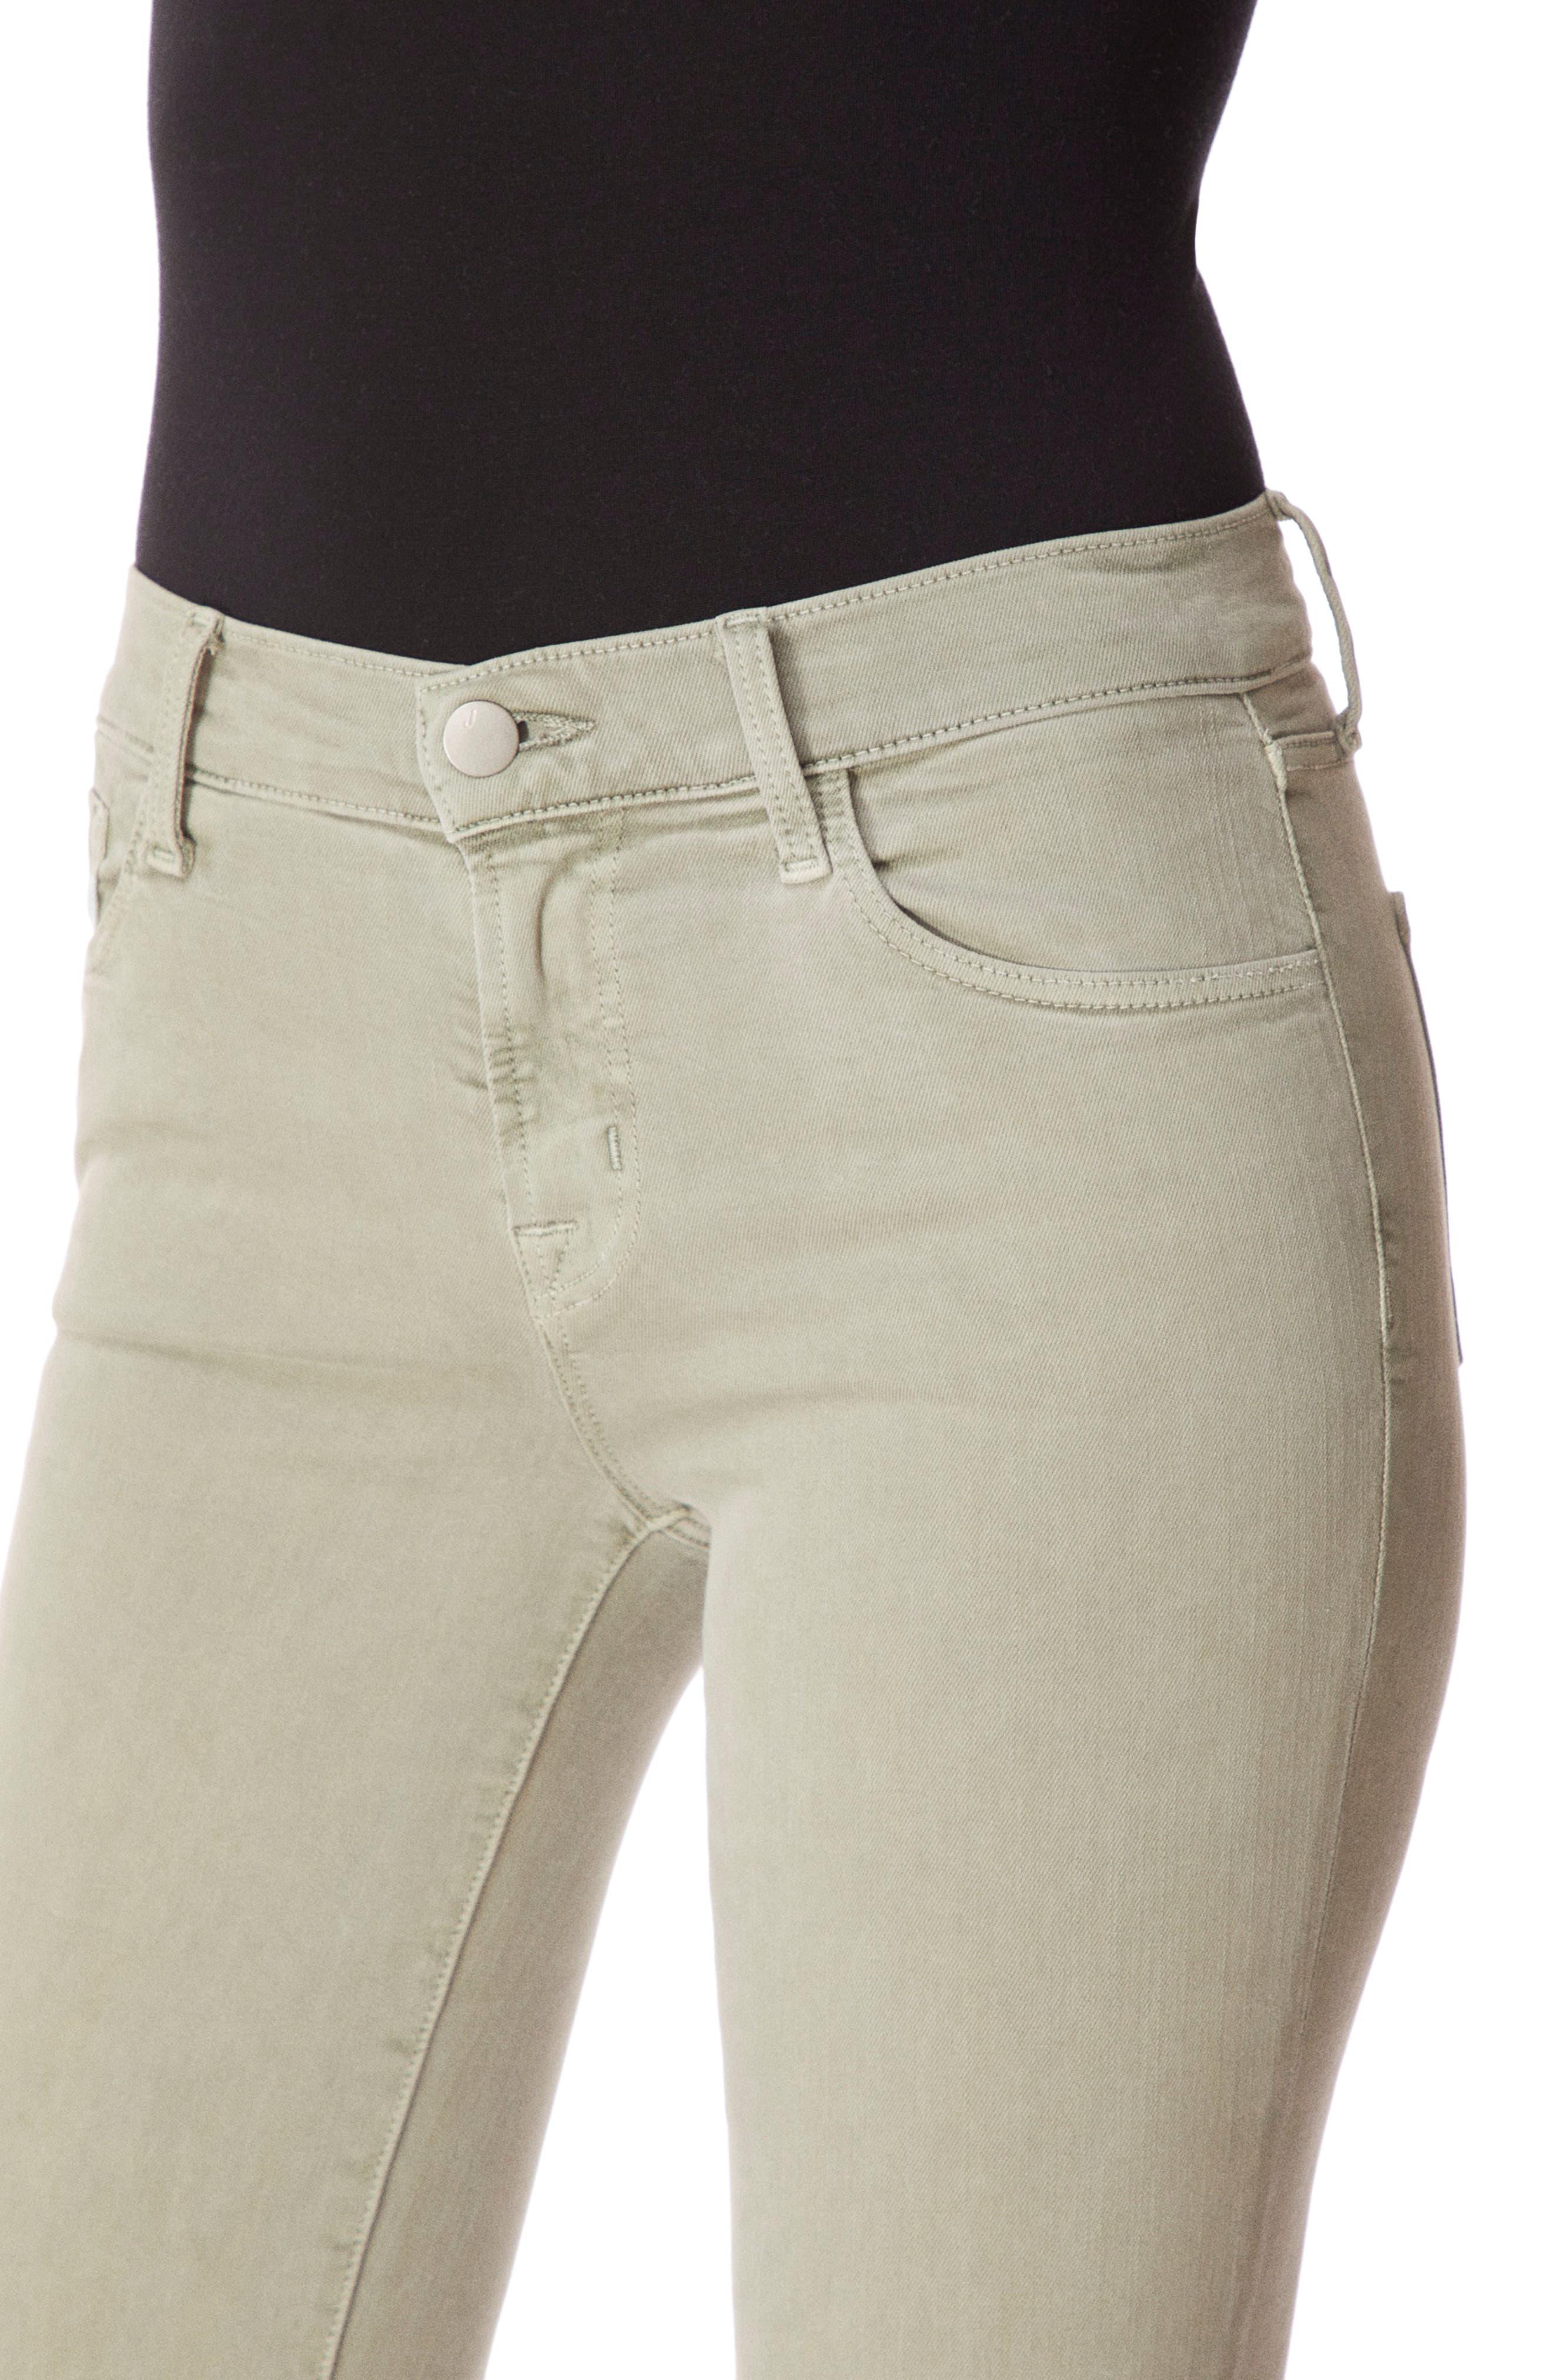 J BRAND, 835 Capri Skinny Jeans, Alternate thumbnail 5, color, FADED GIBSON DESTRUCT